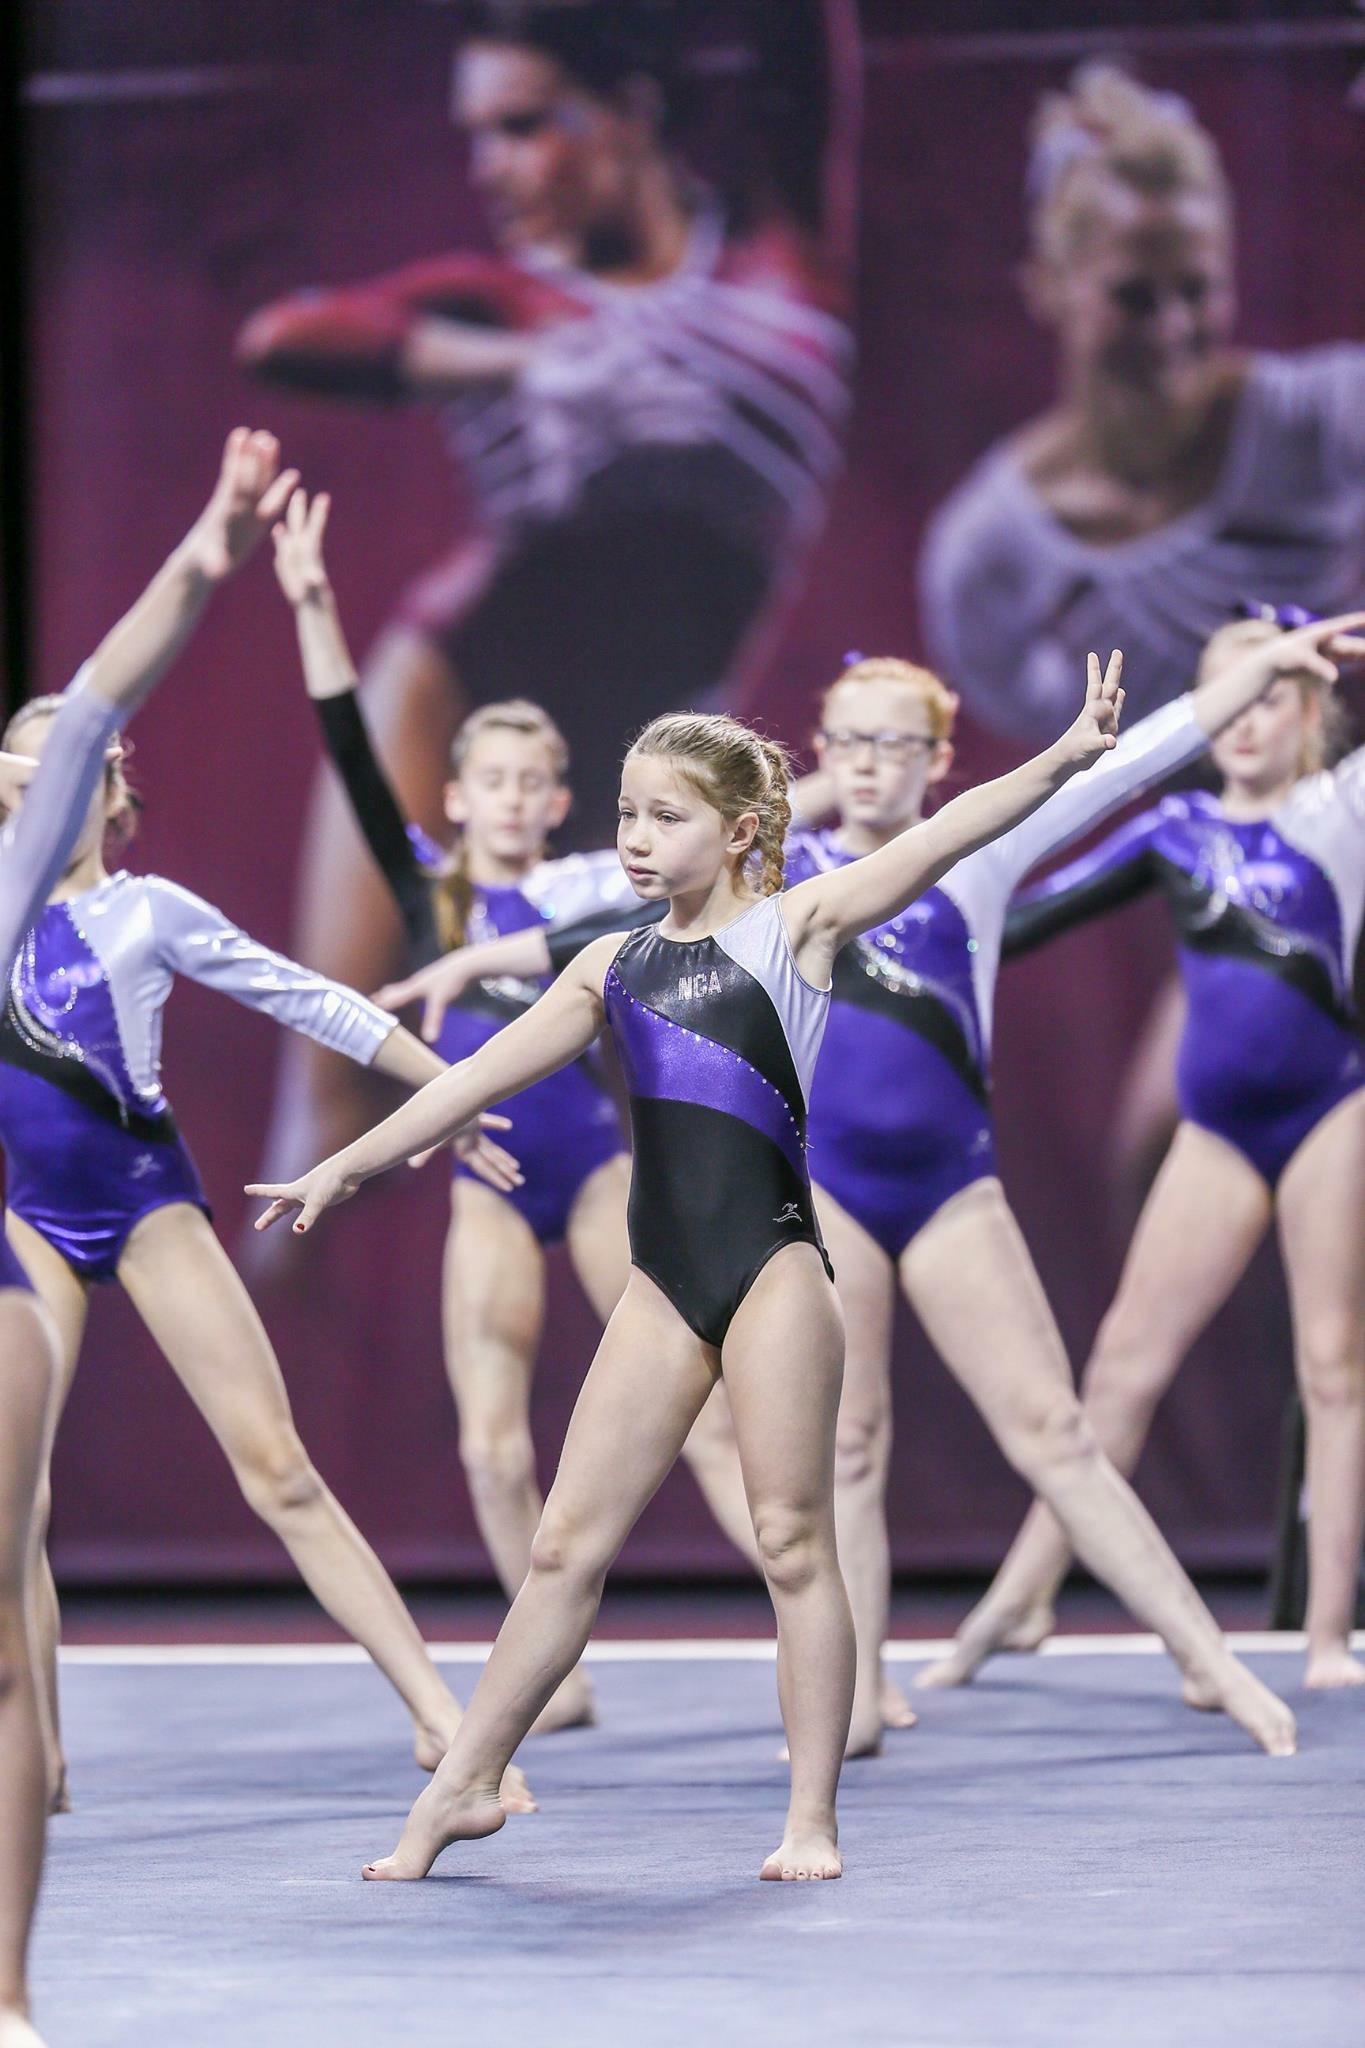 gymnastics global performance testing - HD1365×2048